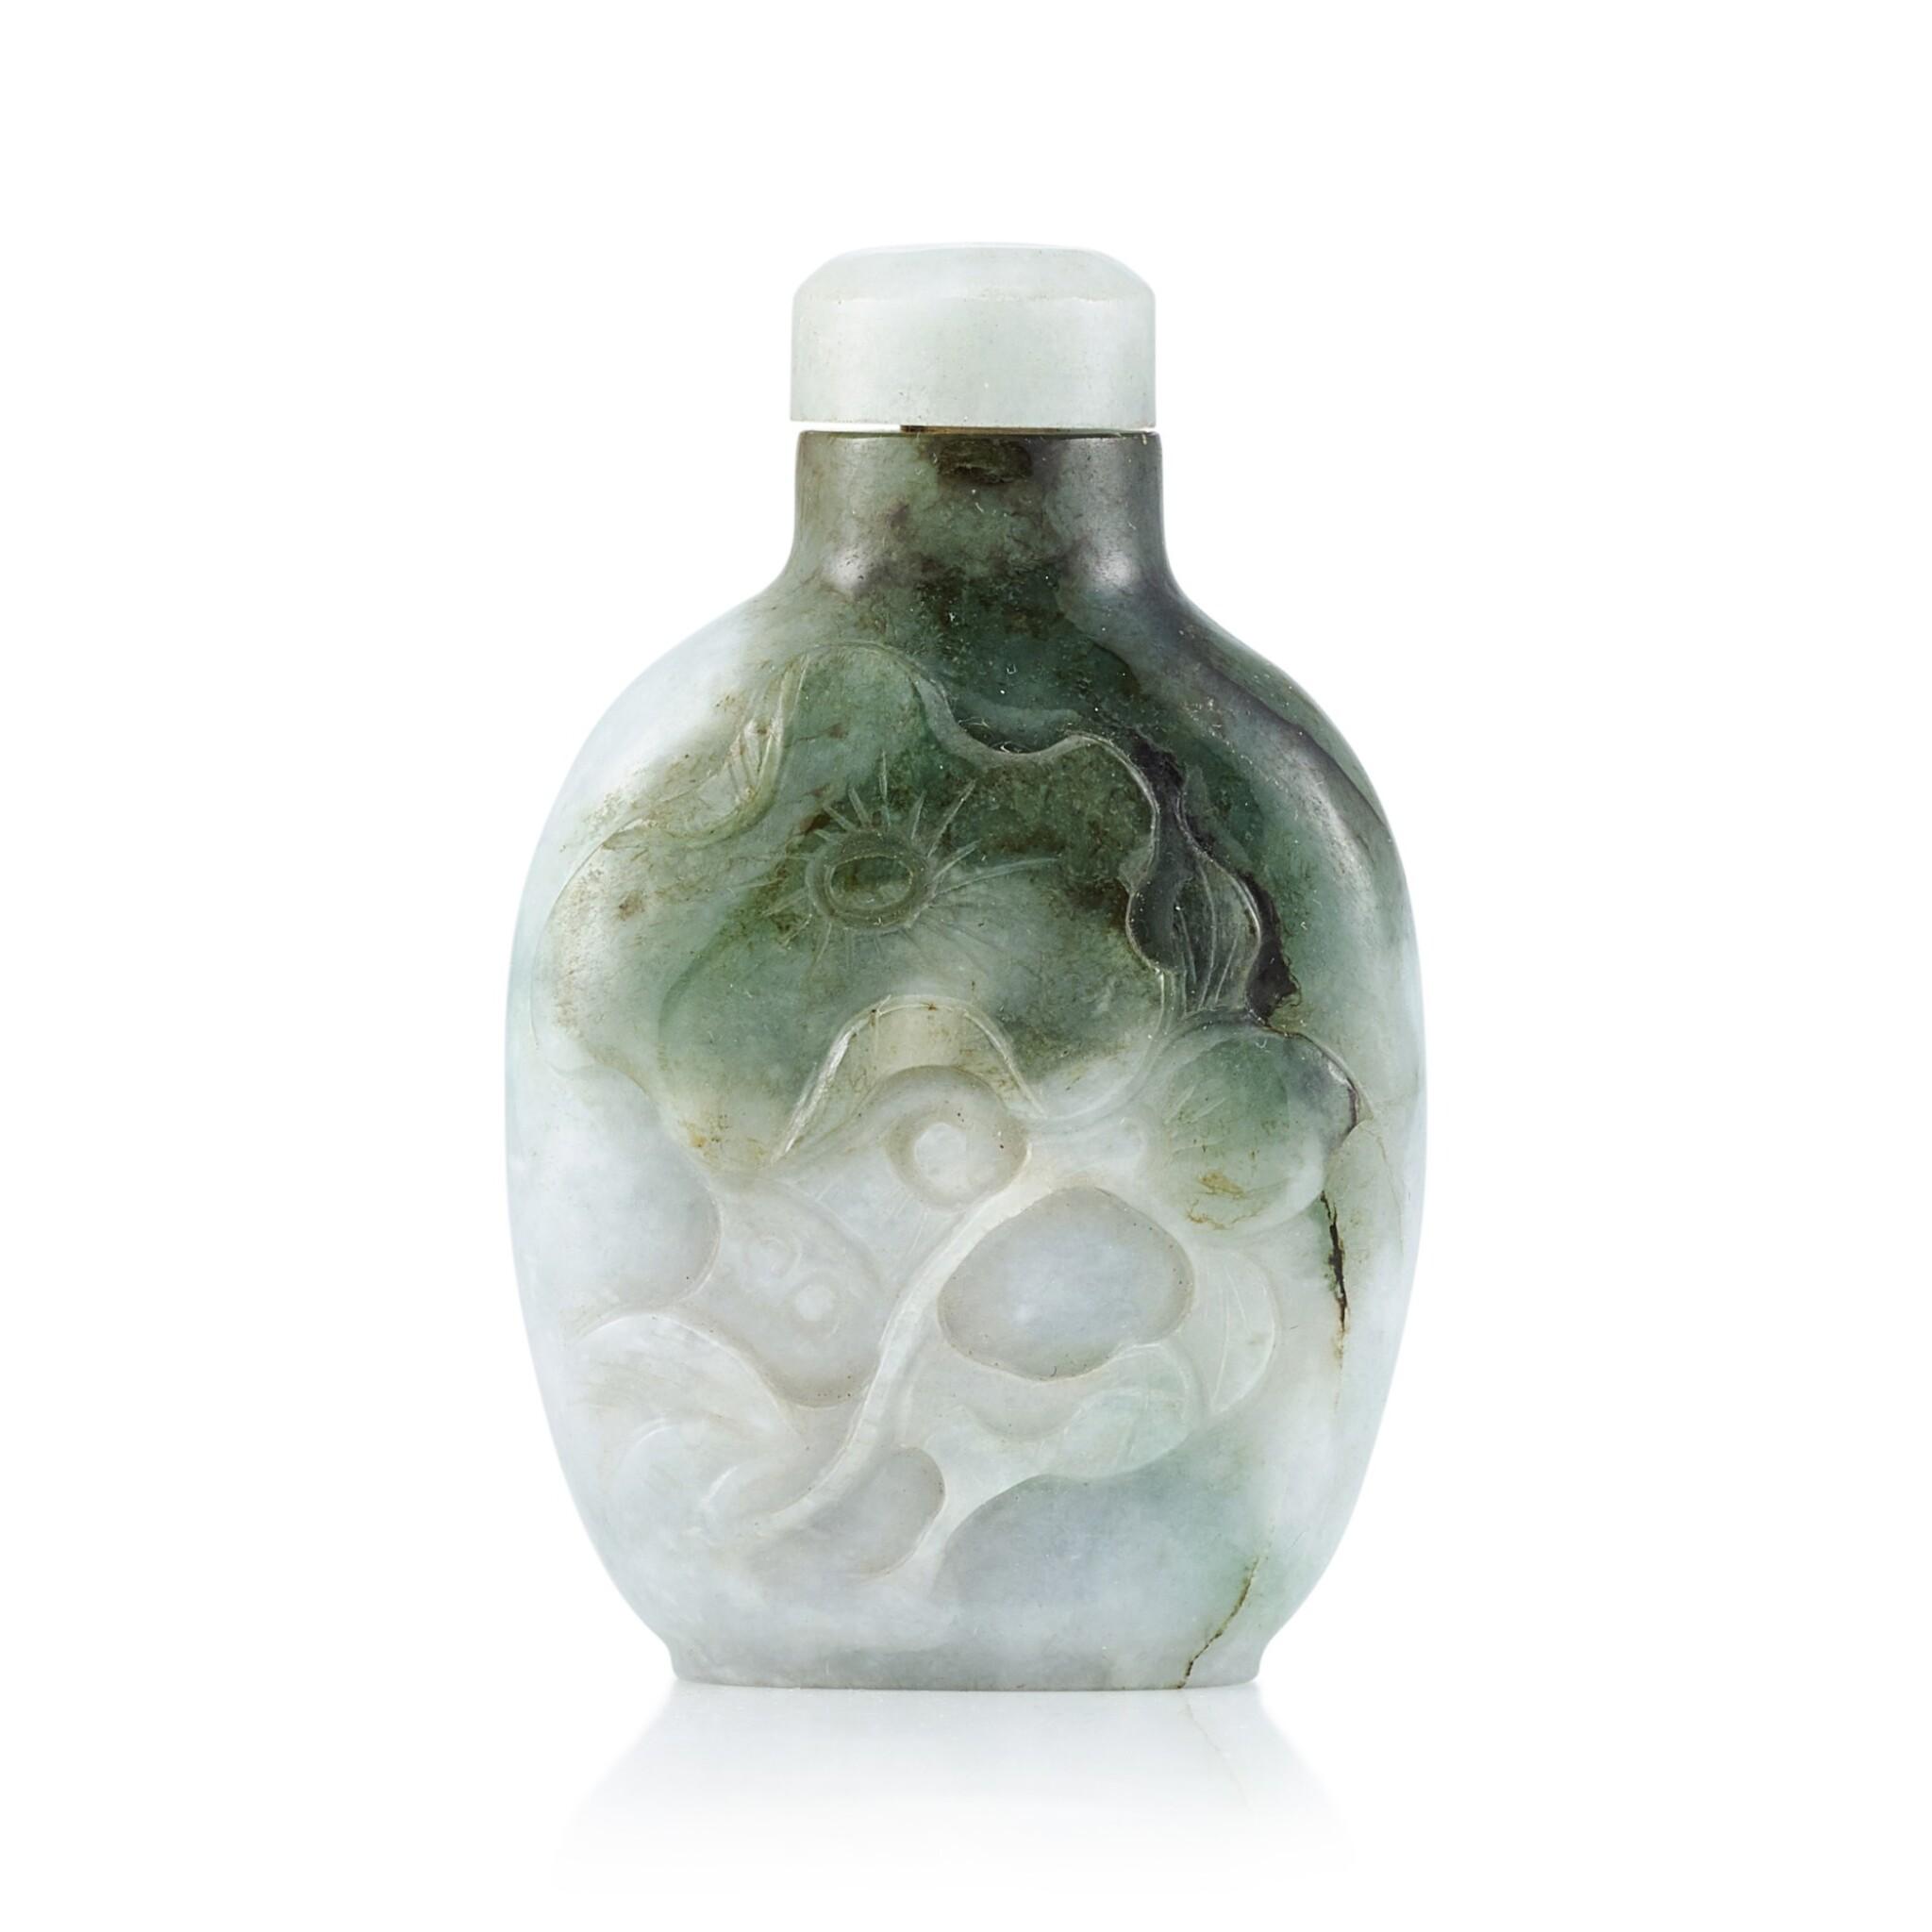 View full screen - View 1 of Lot 3069. A Jadeite 'Fish and Lotus' Snuff Bottle Qing Dynasty, 19th Century | 清十九世紀 翡翠魚藻圖鼻煙壺.